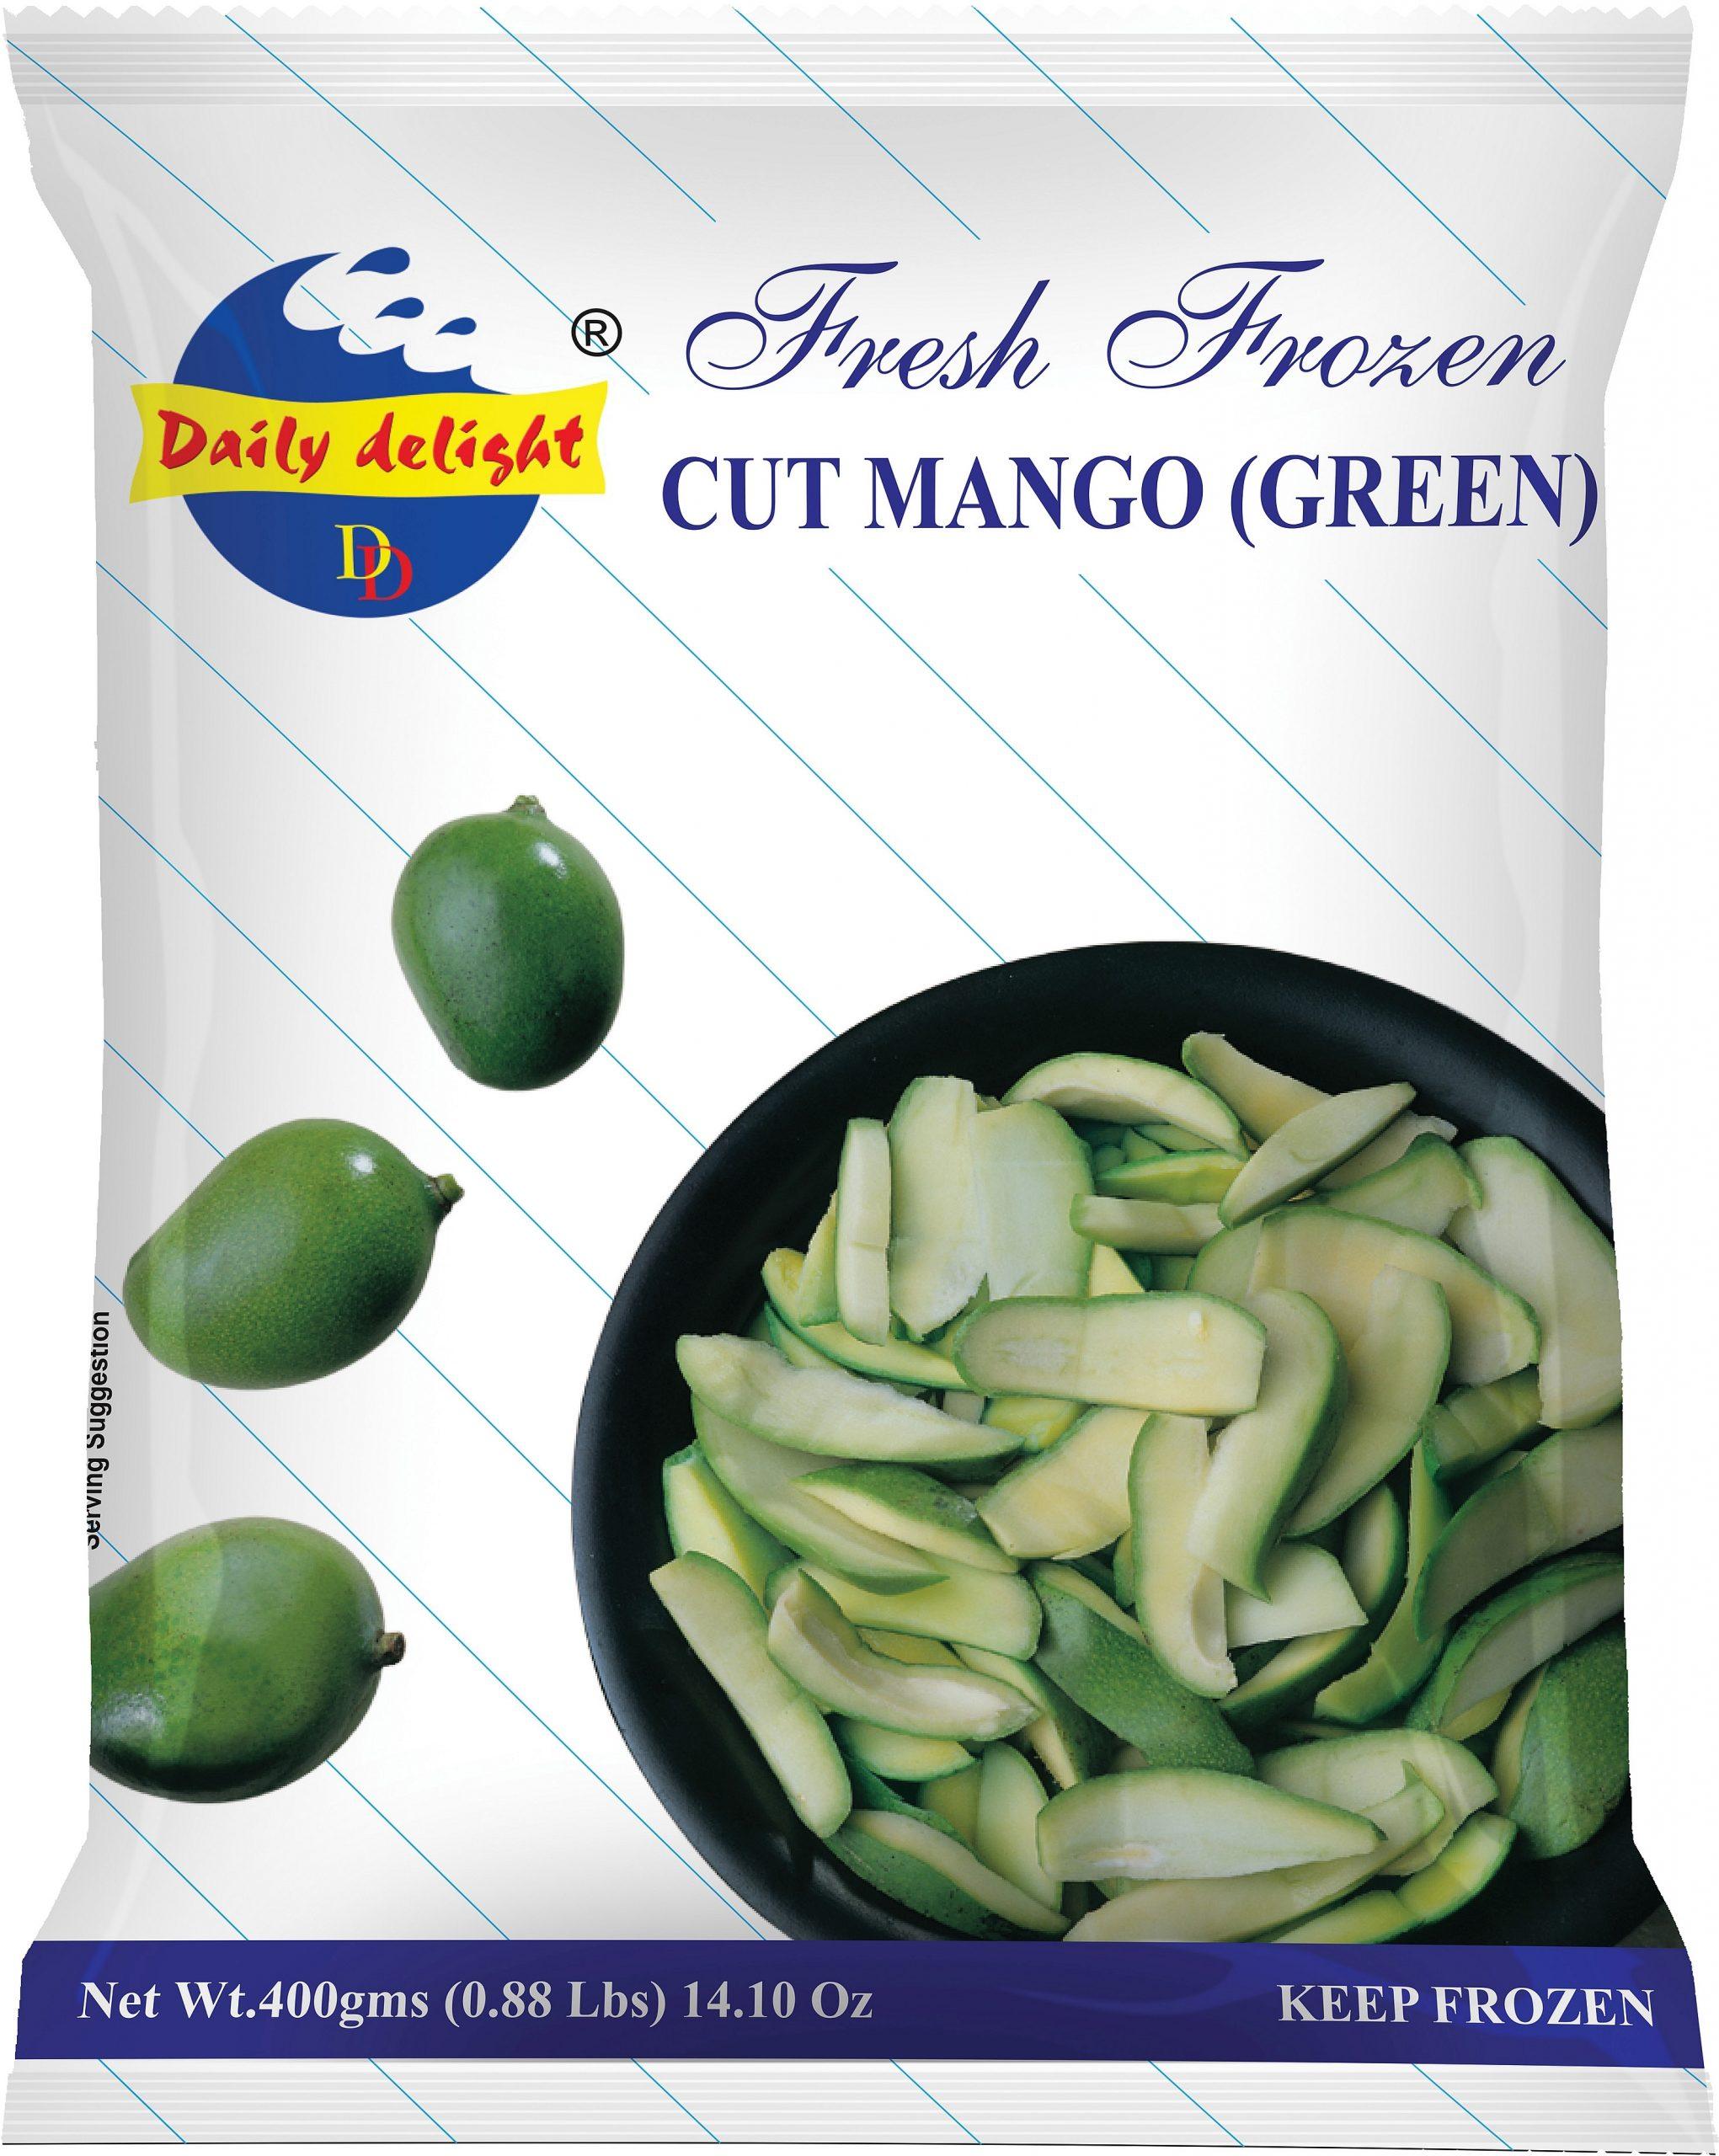 Daily Delight Cut Mango Green